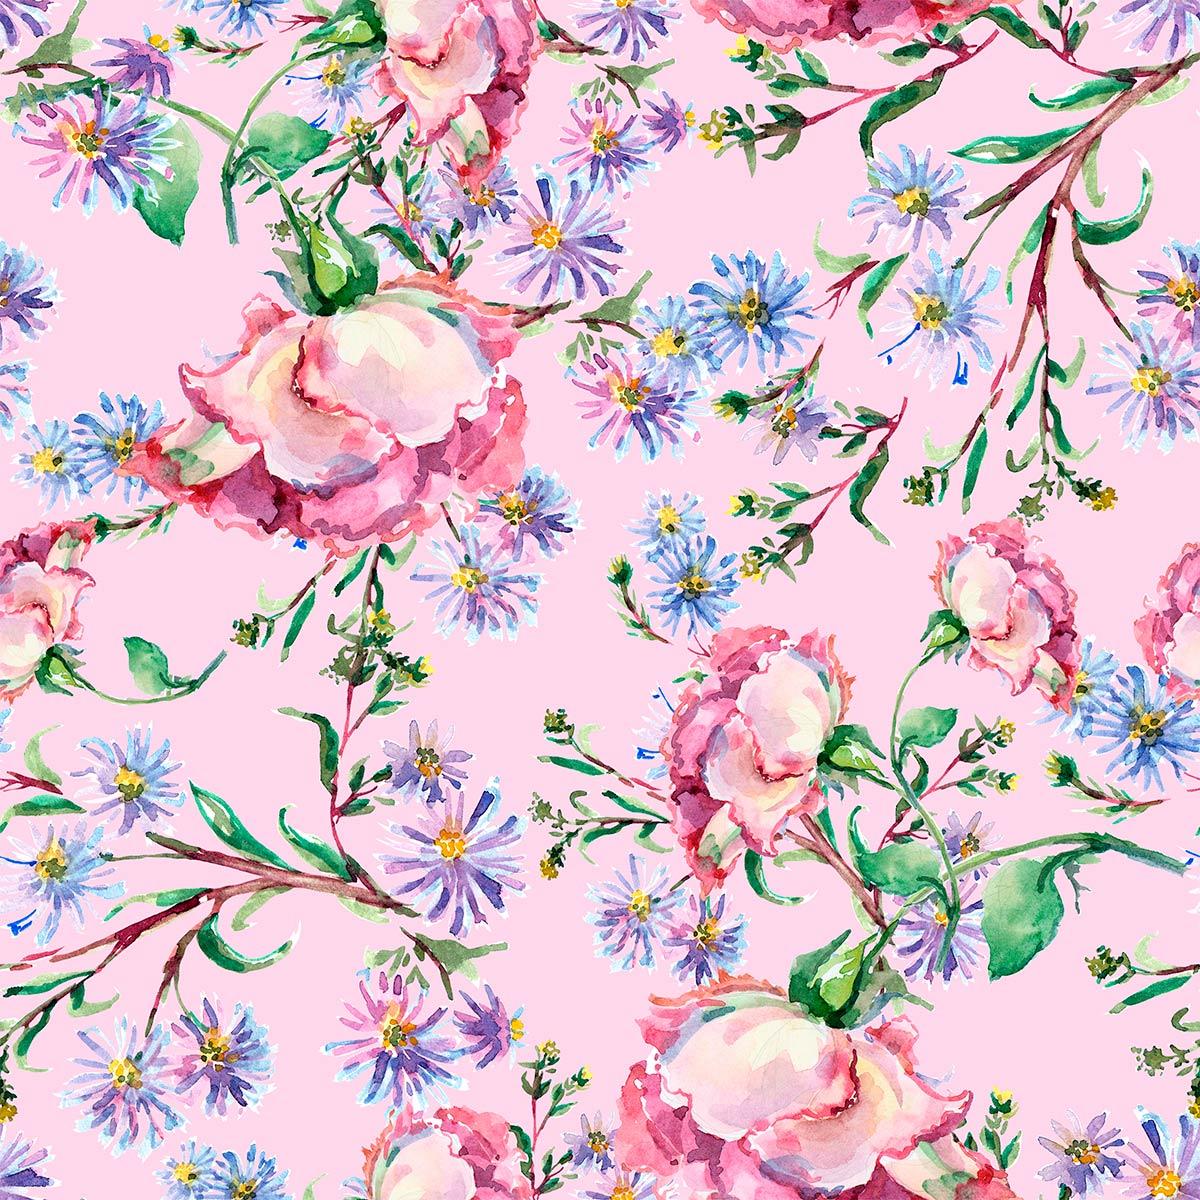 Papel de Parede Floral Galhos Flores Rosas Adesivo